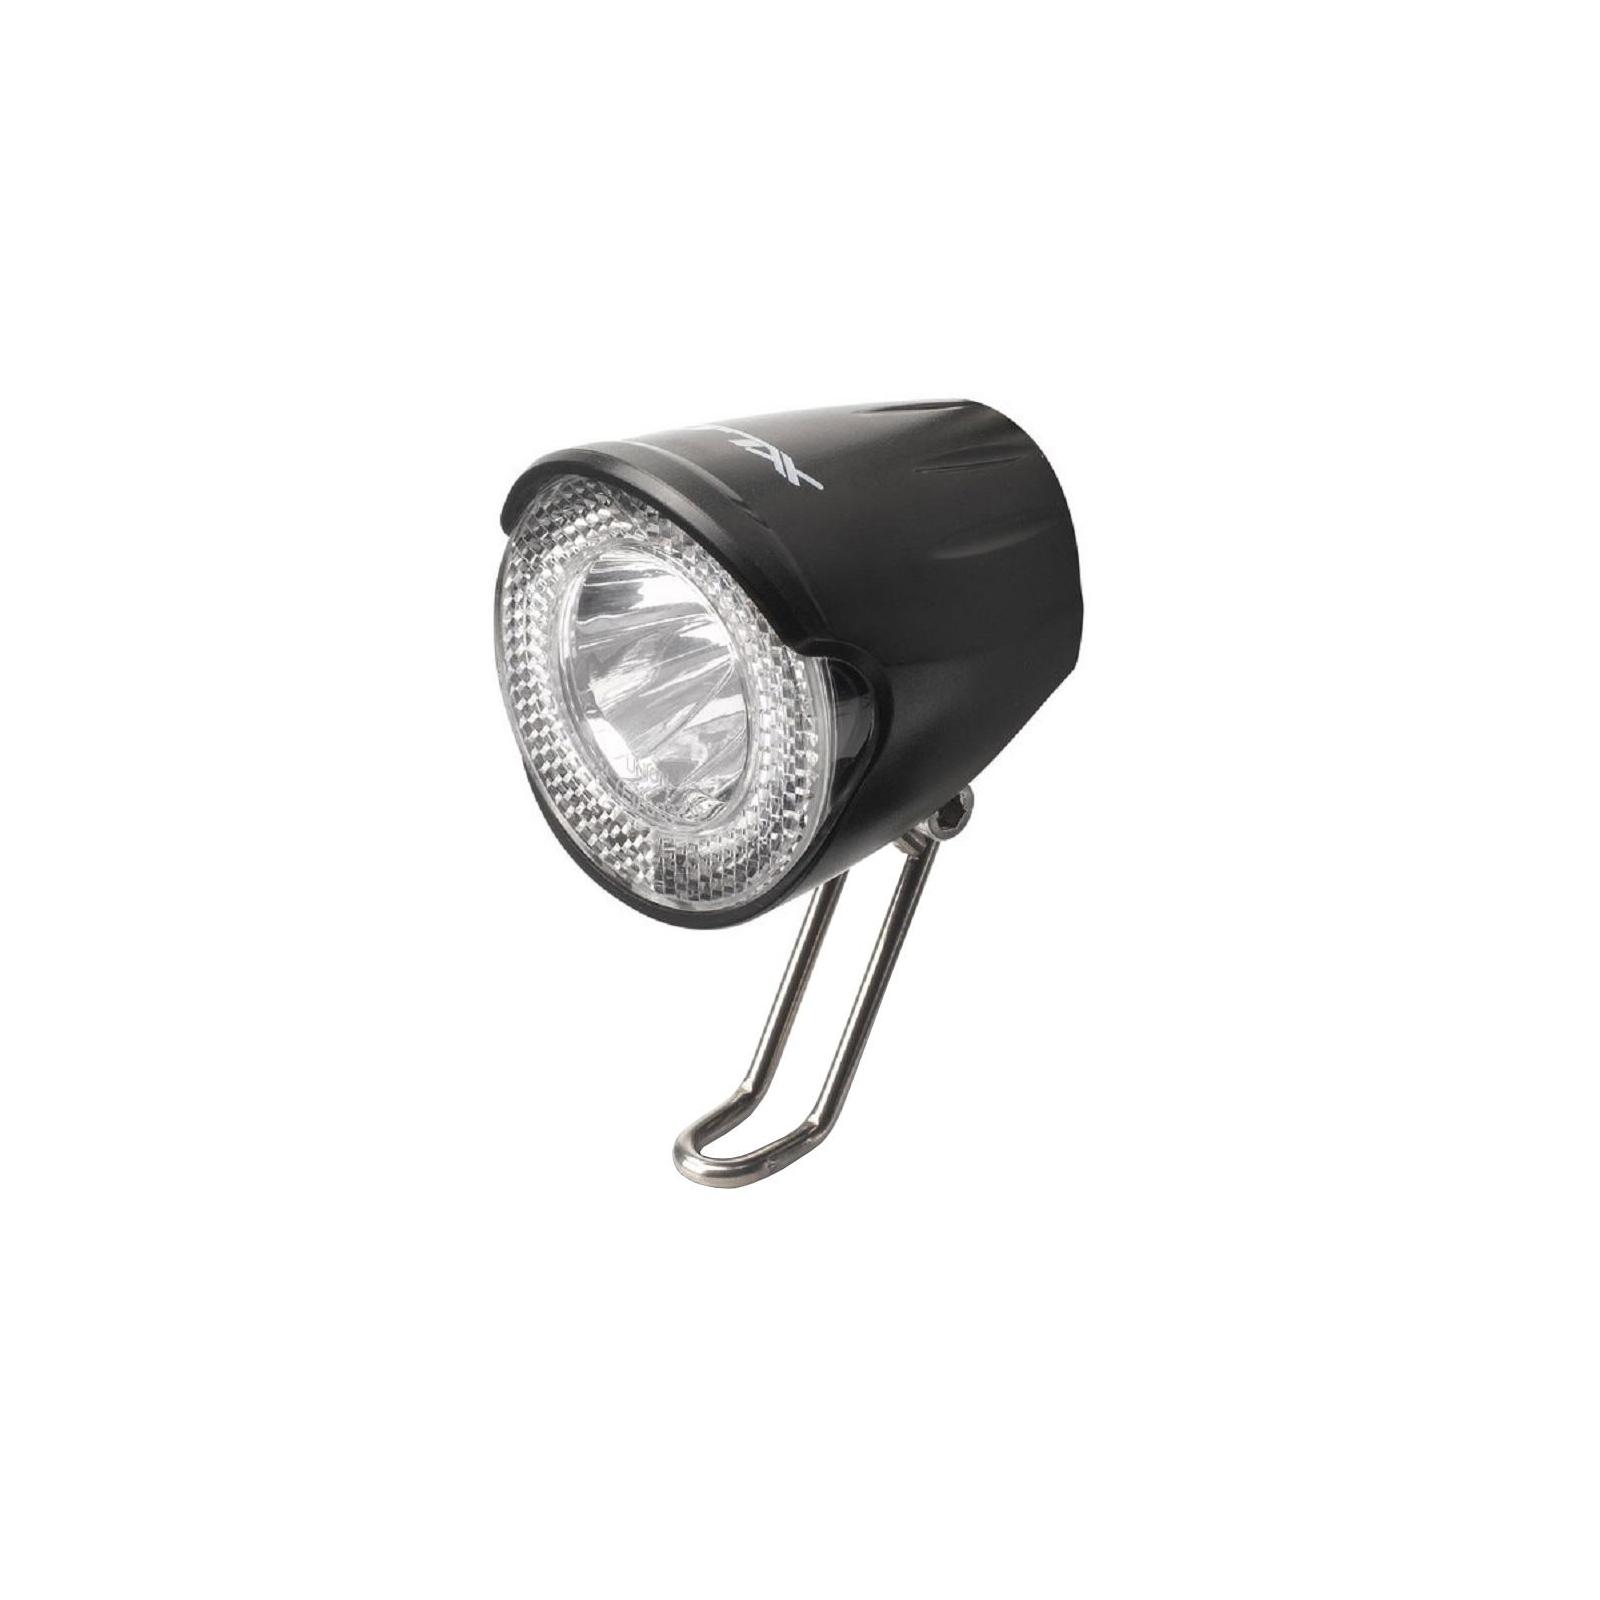 Передняя велофара XLC LED 20Lux, черный (2500220500)